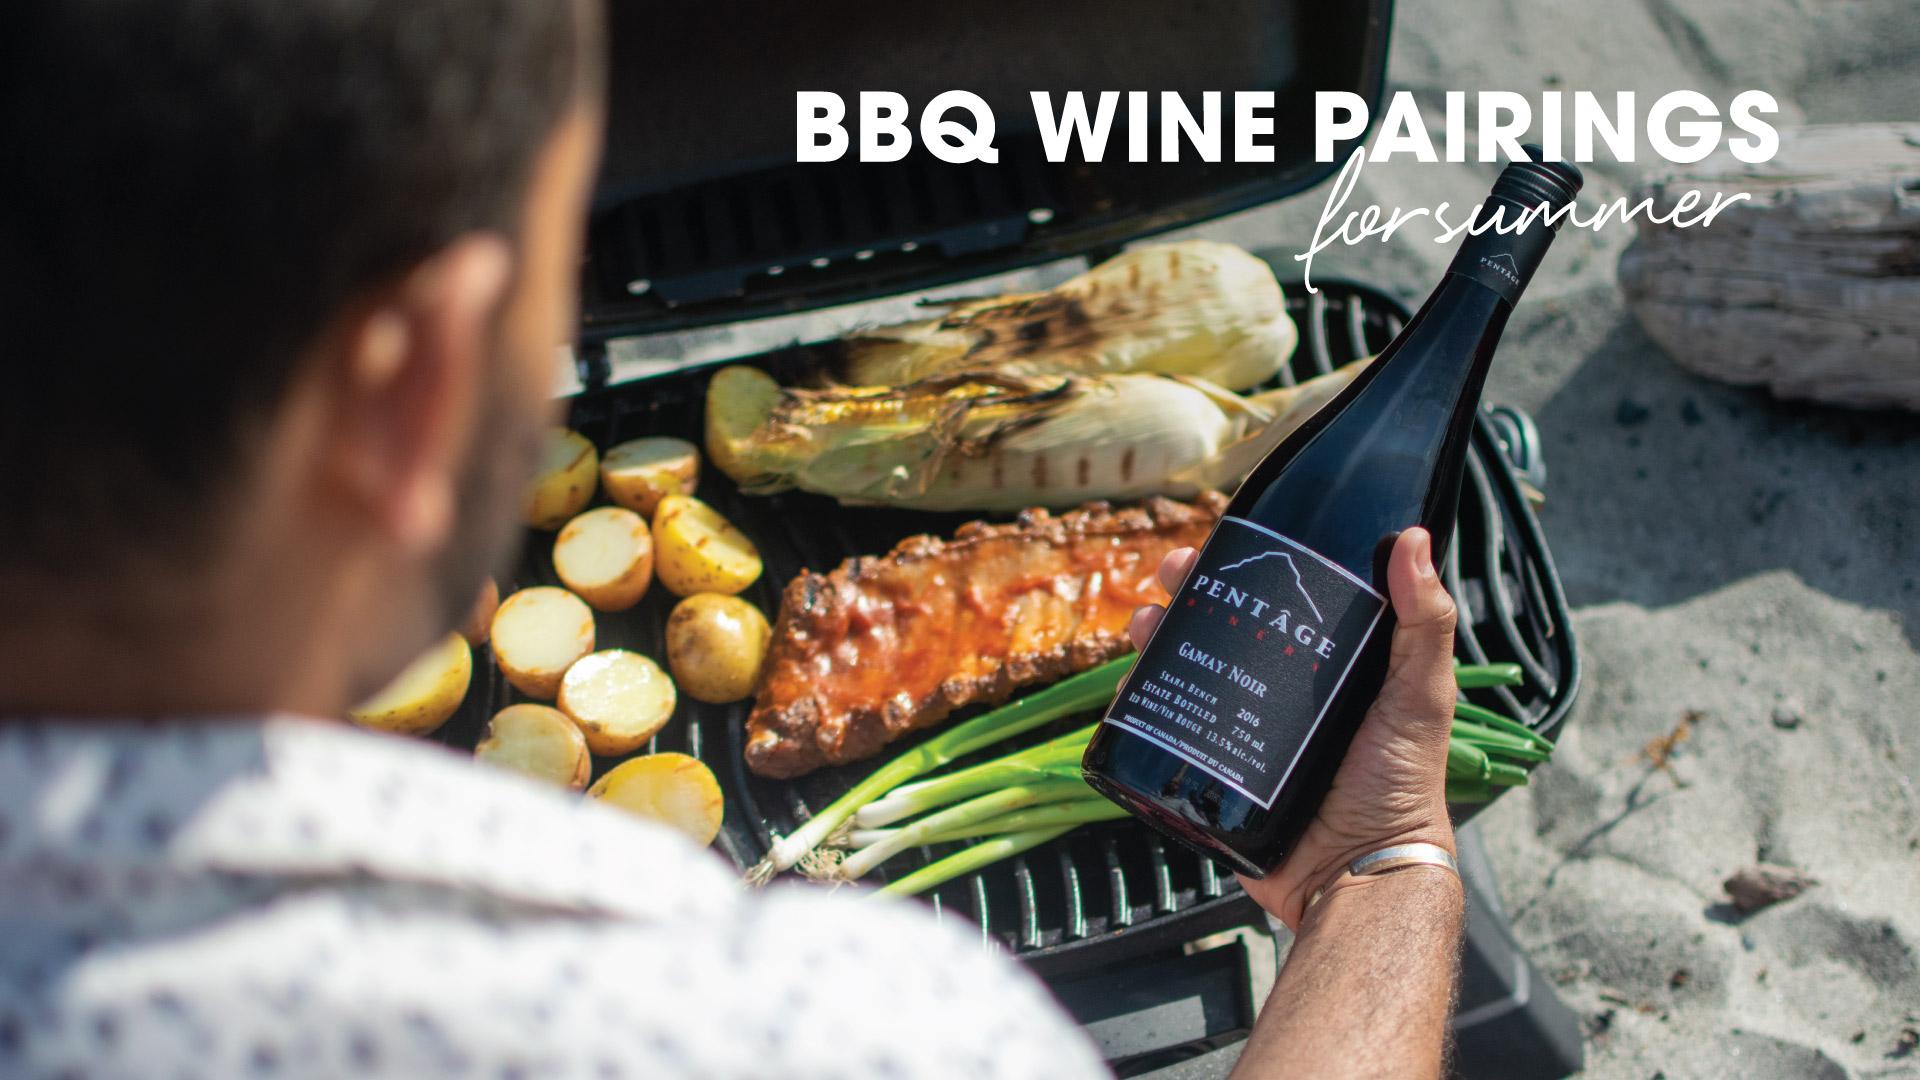 bbq_wine_pairings_for_summer_article_header.jpg